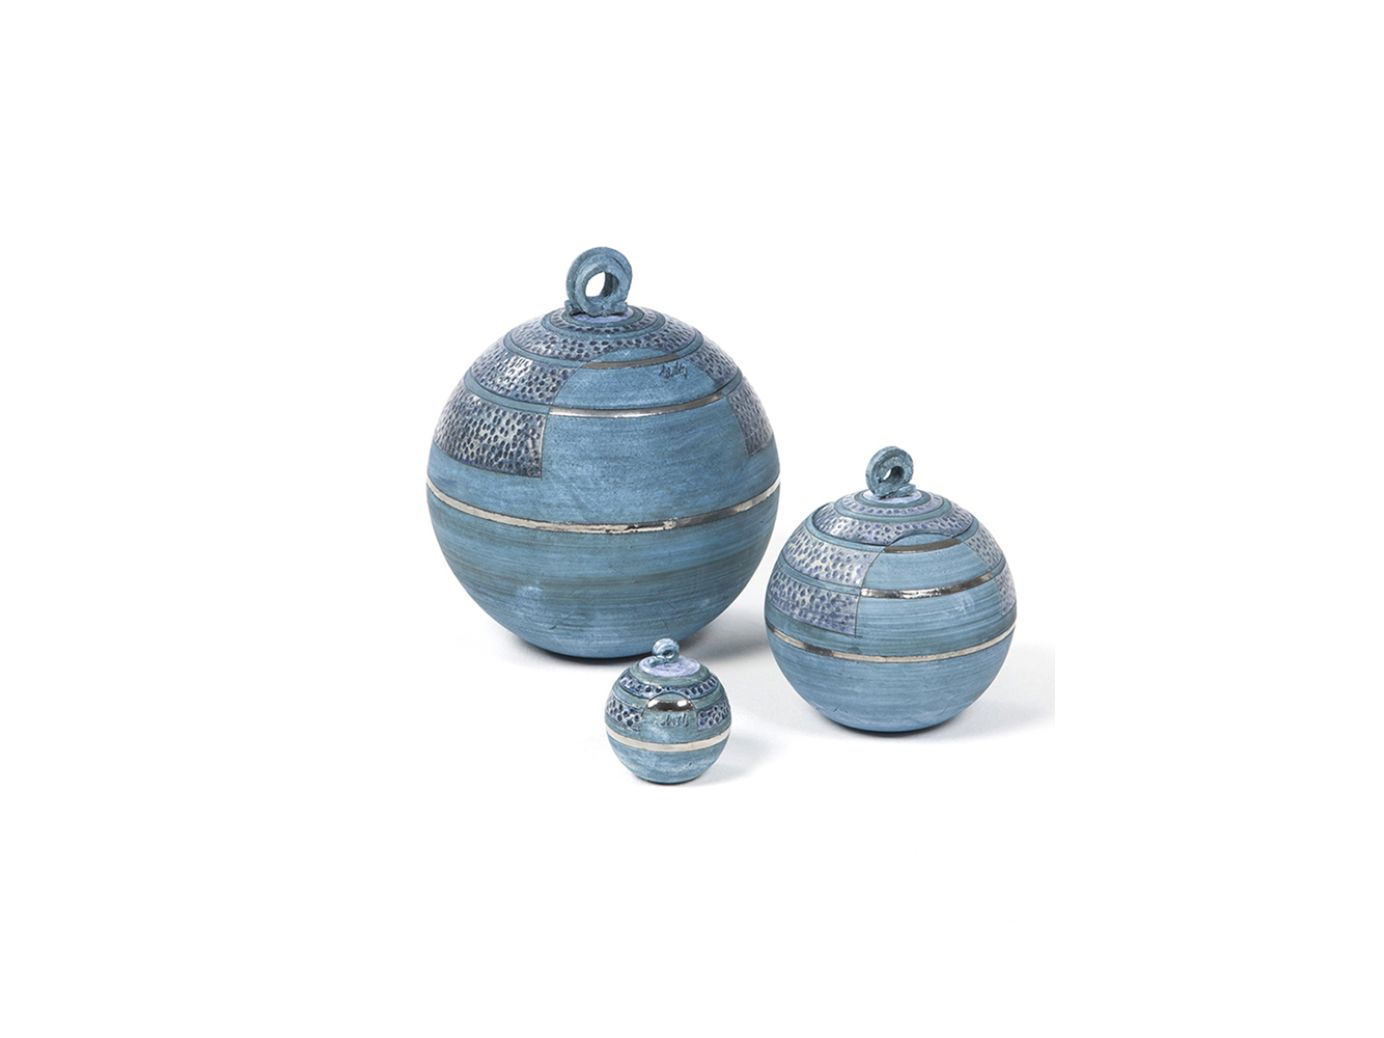 Keramische mini urn blauw bol met decoratie 0.1l 9488